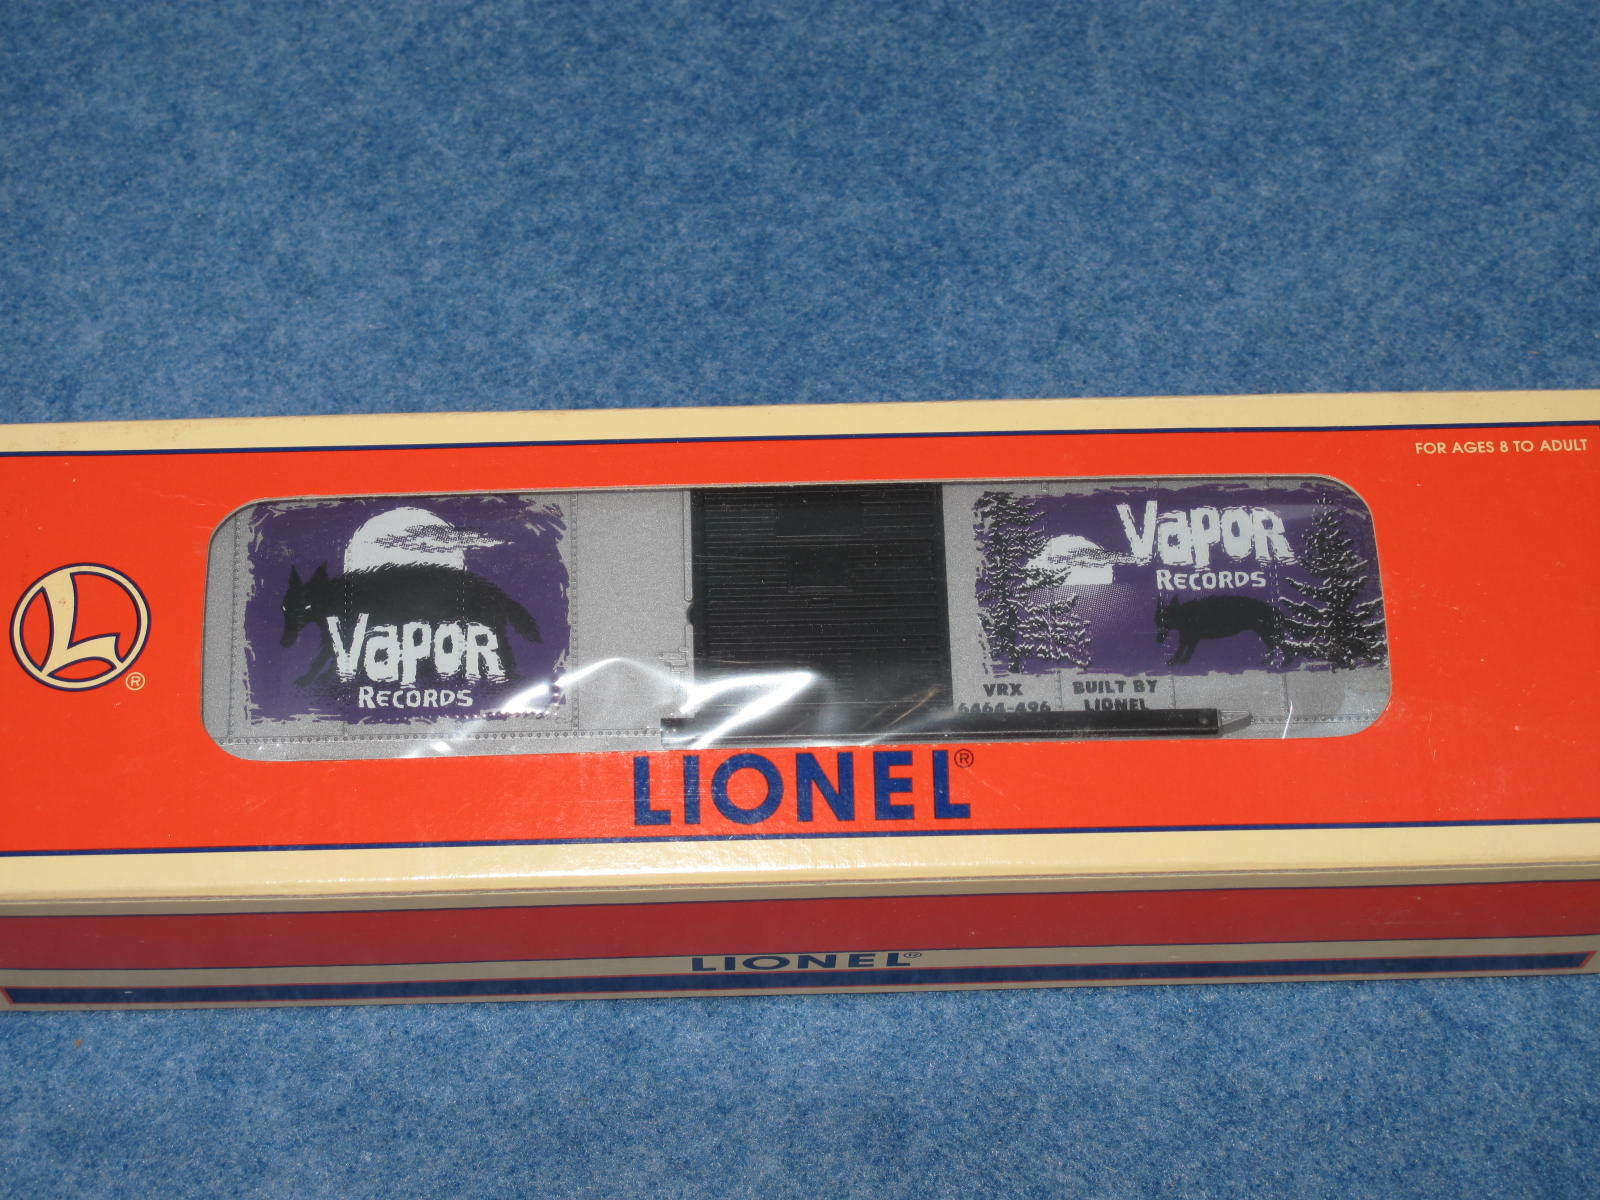 1997 Lionel 6-29218 Vapor Records Box Car 6464-496 L1010